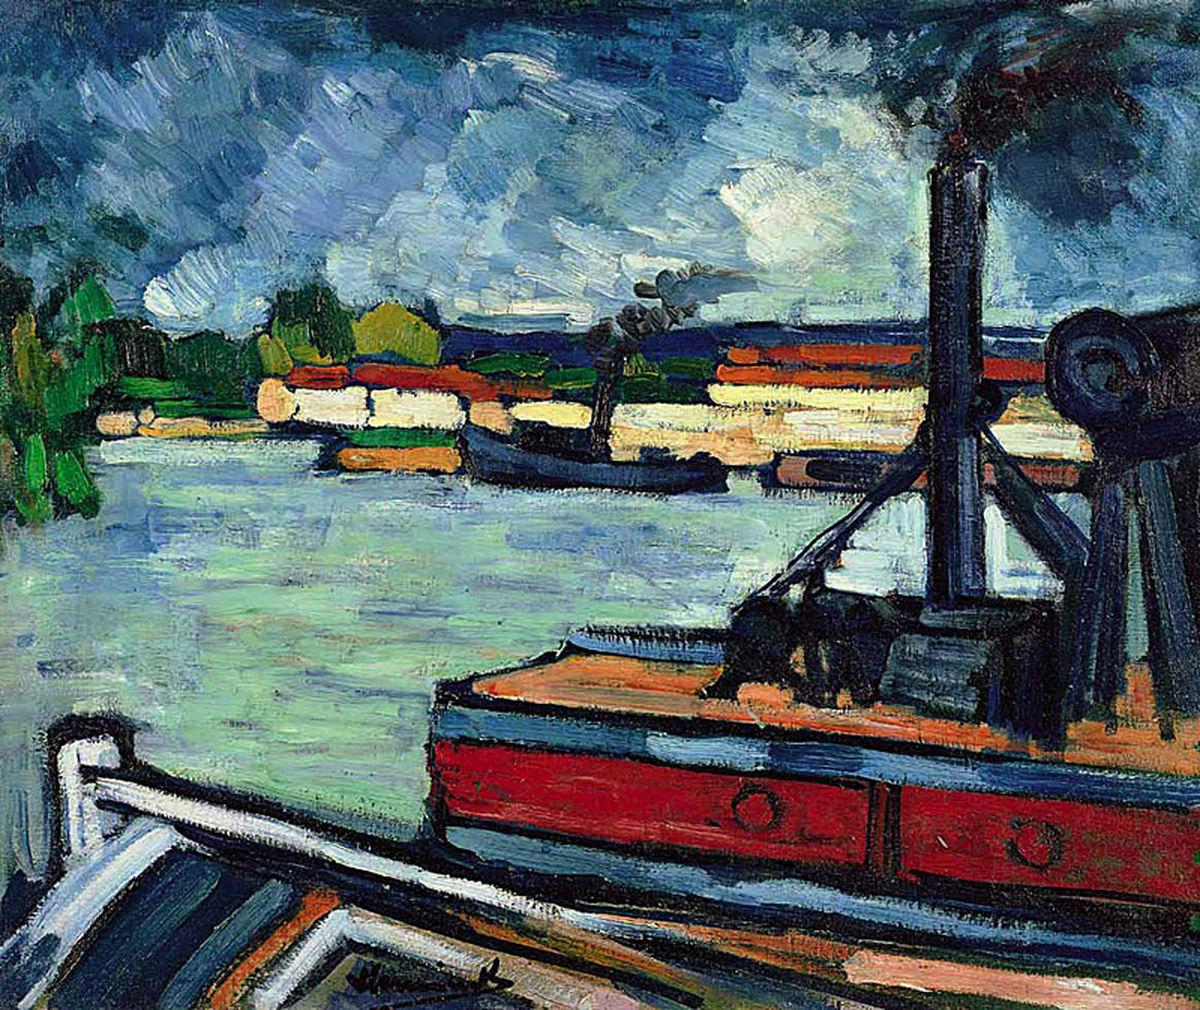 kundst:Maurice de Vlaminck (Be. 1876-1956)The river Seine near Nanterre (1906-1907) Oil on canvas, 60 x 73cmVan Gogh Museum